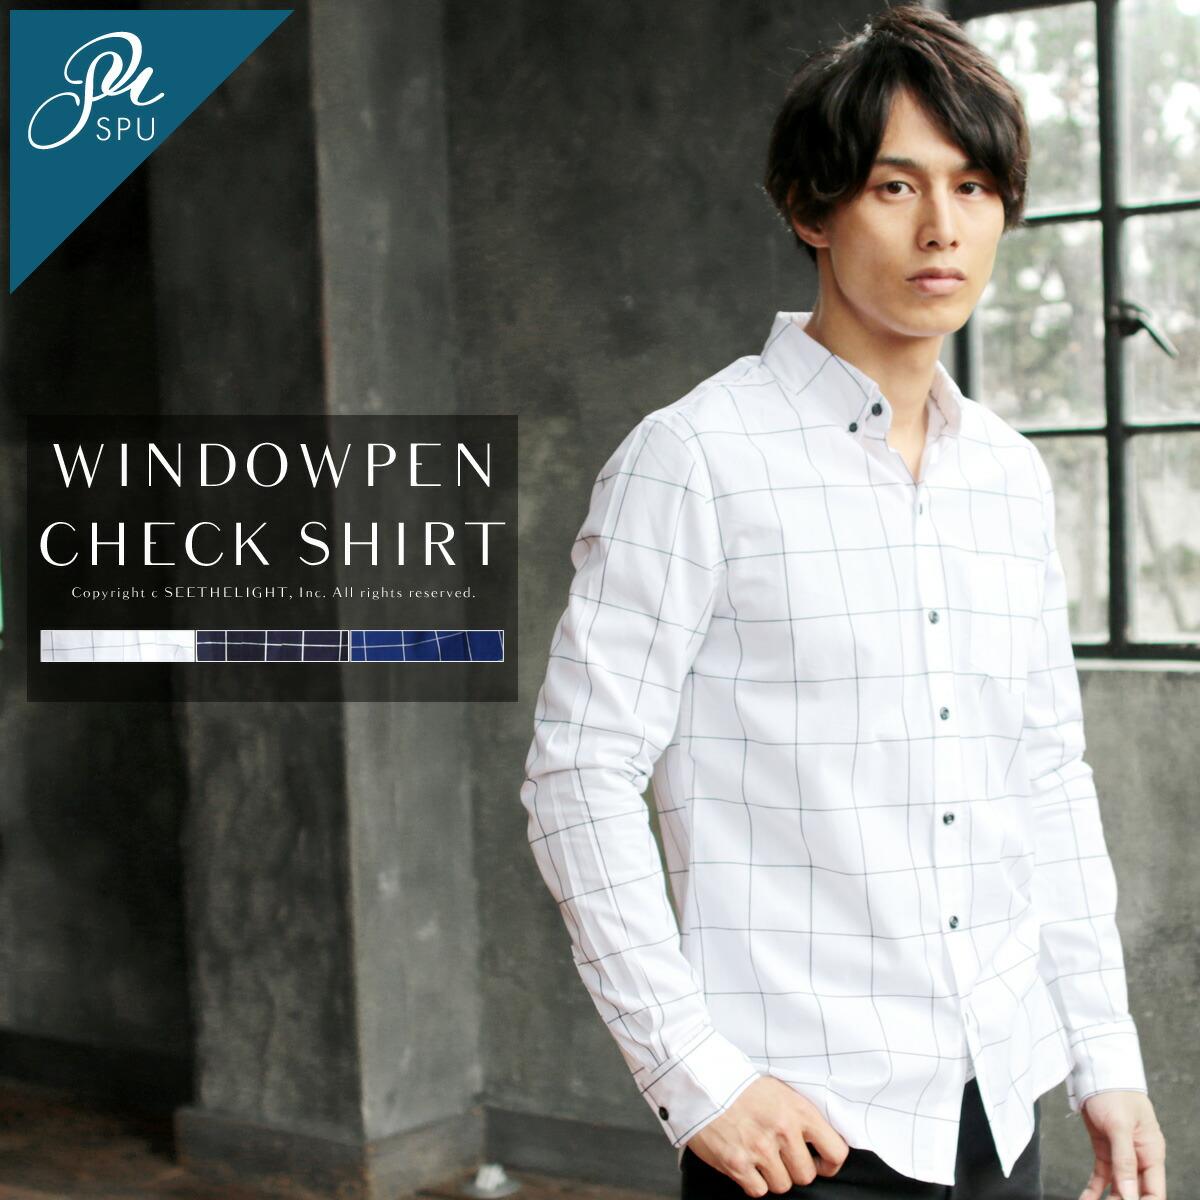 SPU スプ メンズ オリジナルウインドペン ブロード生地 長袖 シャツ